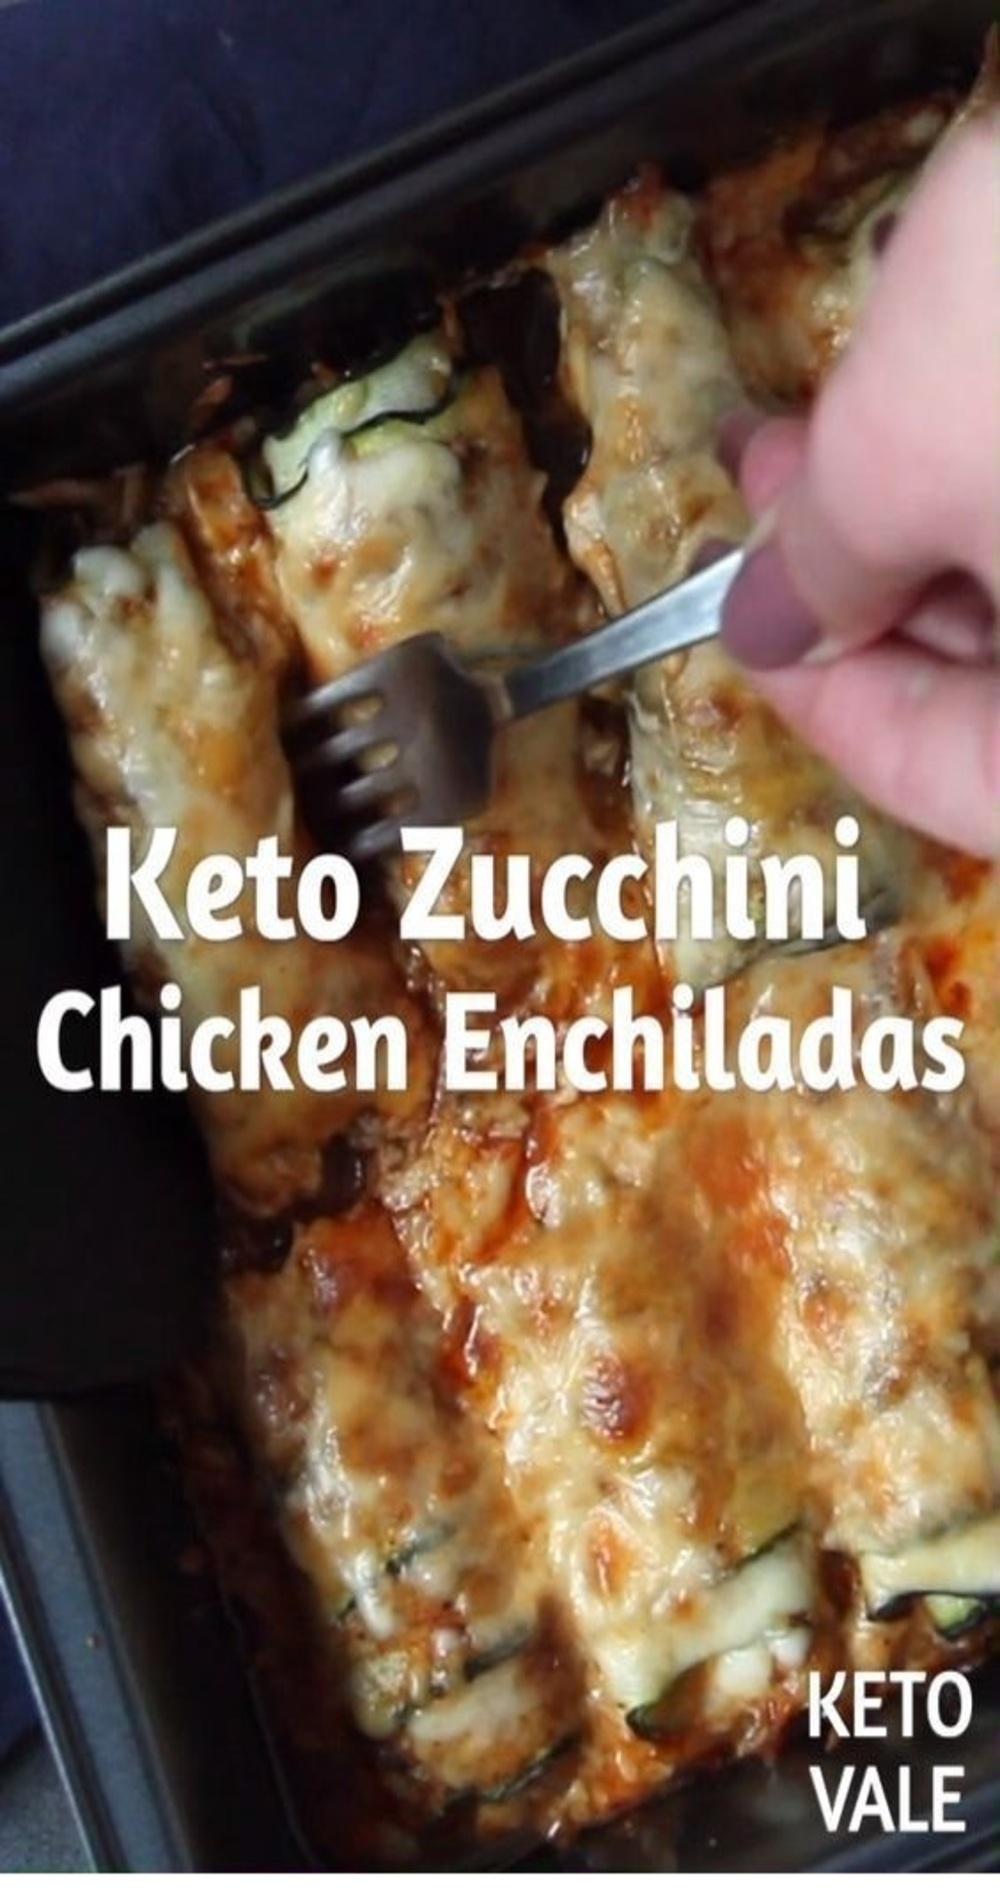 Keto Zucchini Chicken Enchiladas